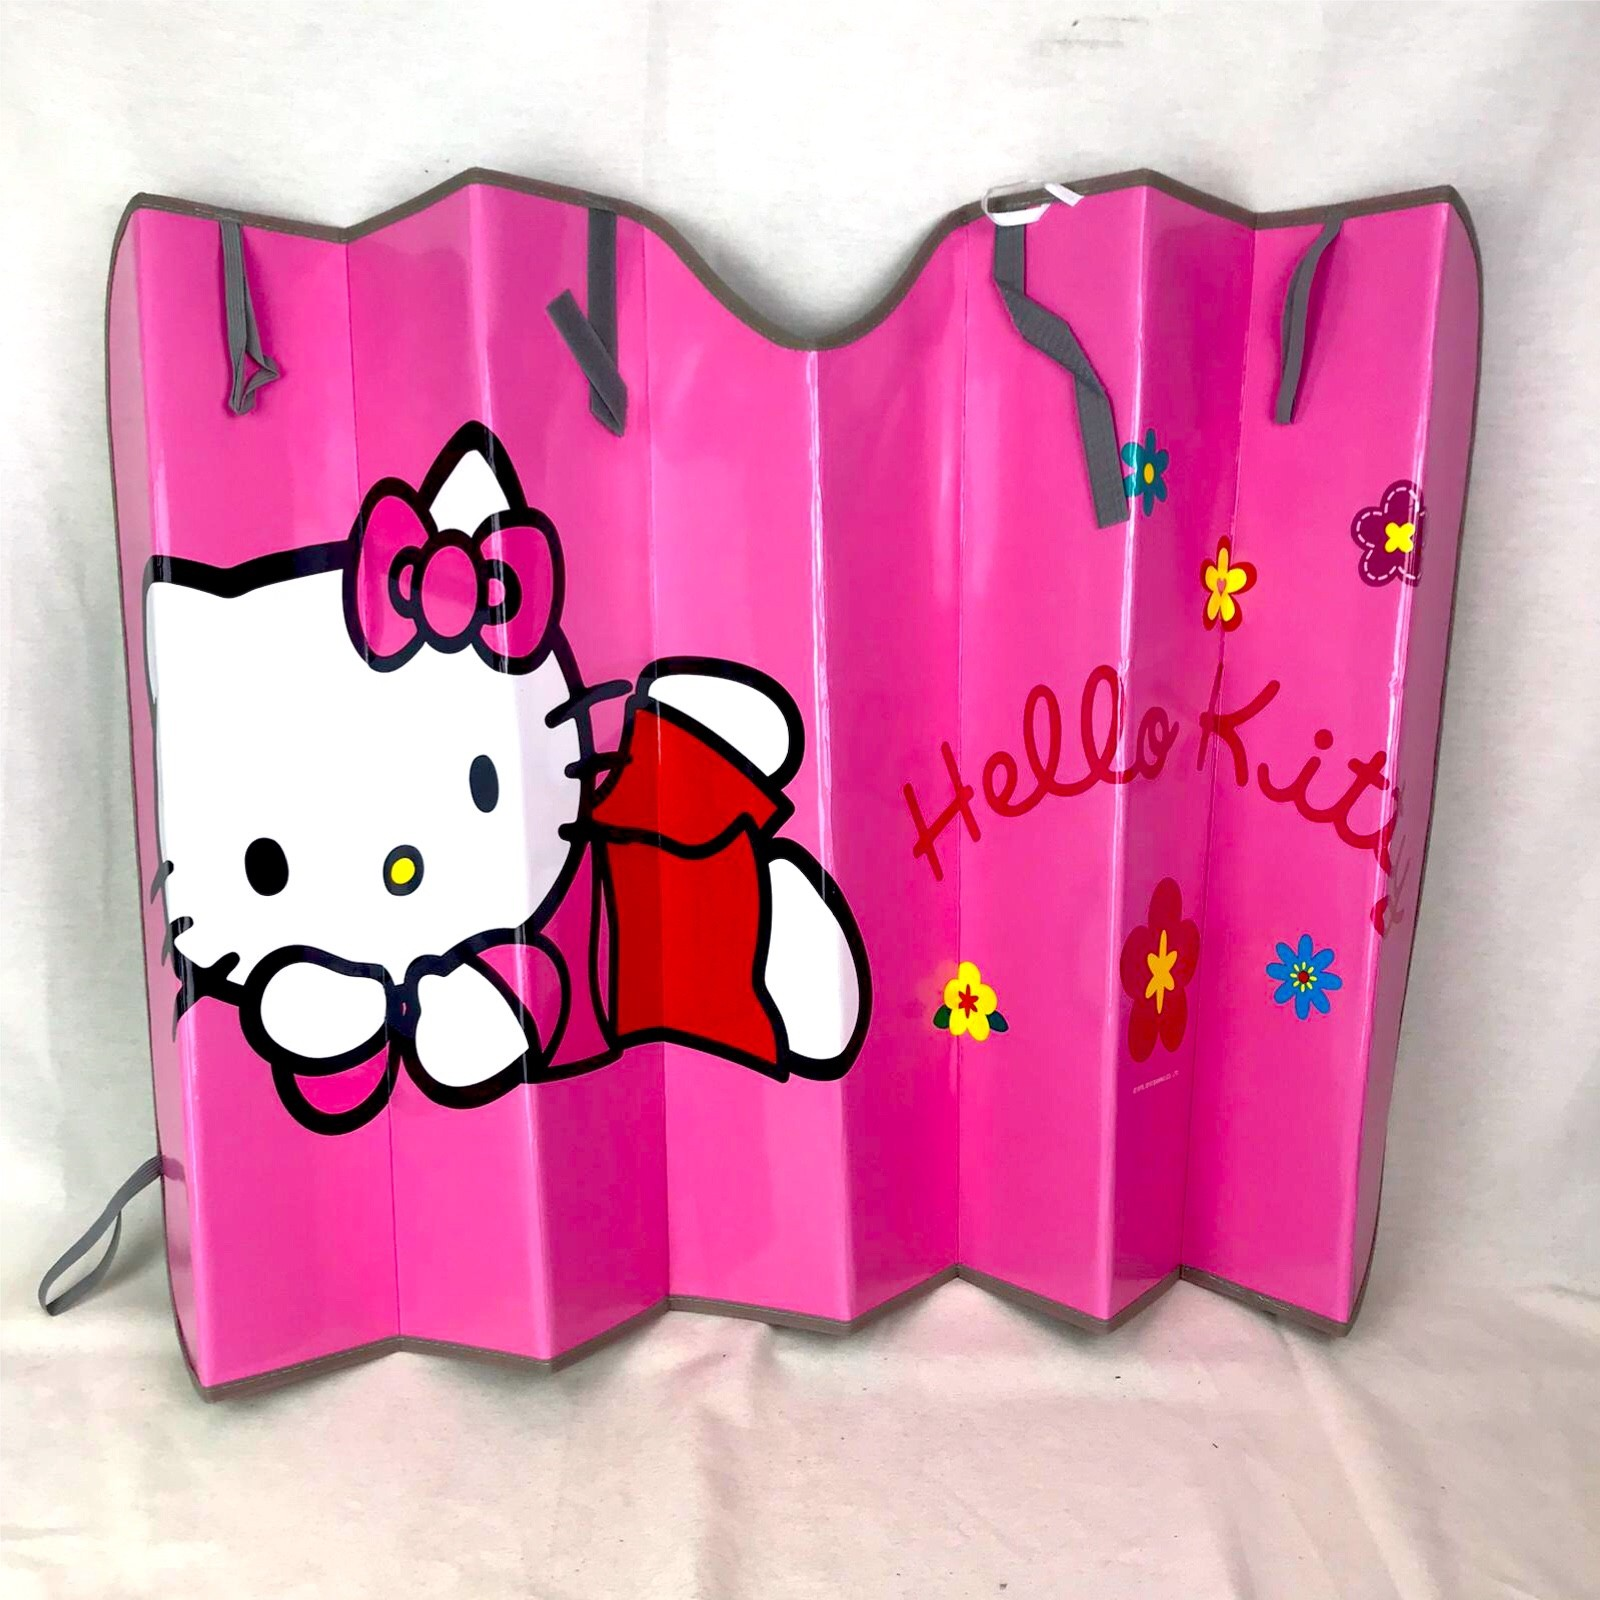 Hello Kitty Rigid Sun Protection Screens, M, L & XL Est. Original Retail €3,200, Vilnius, LT